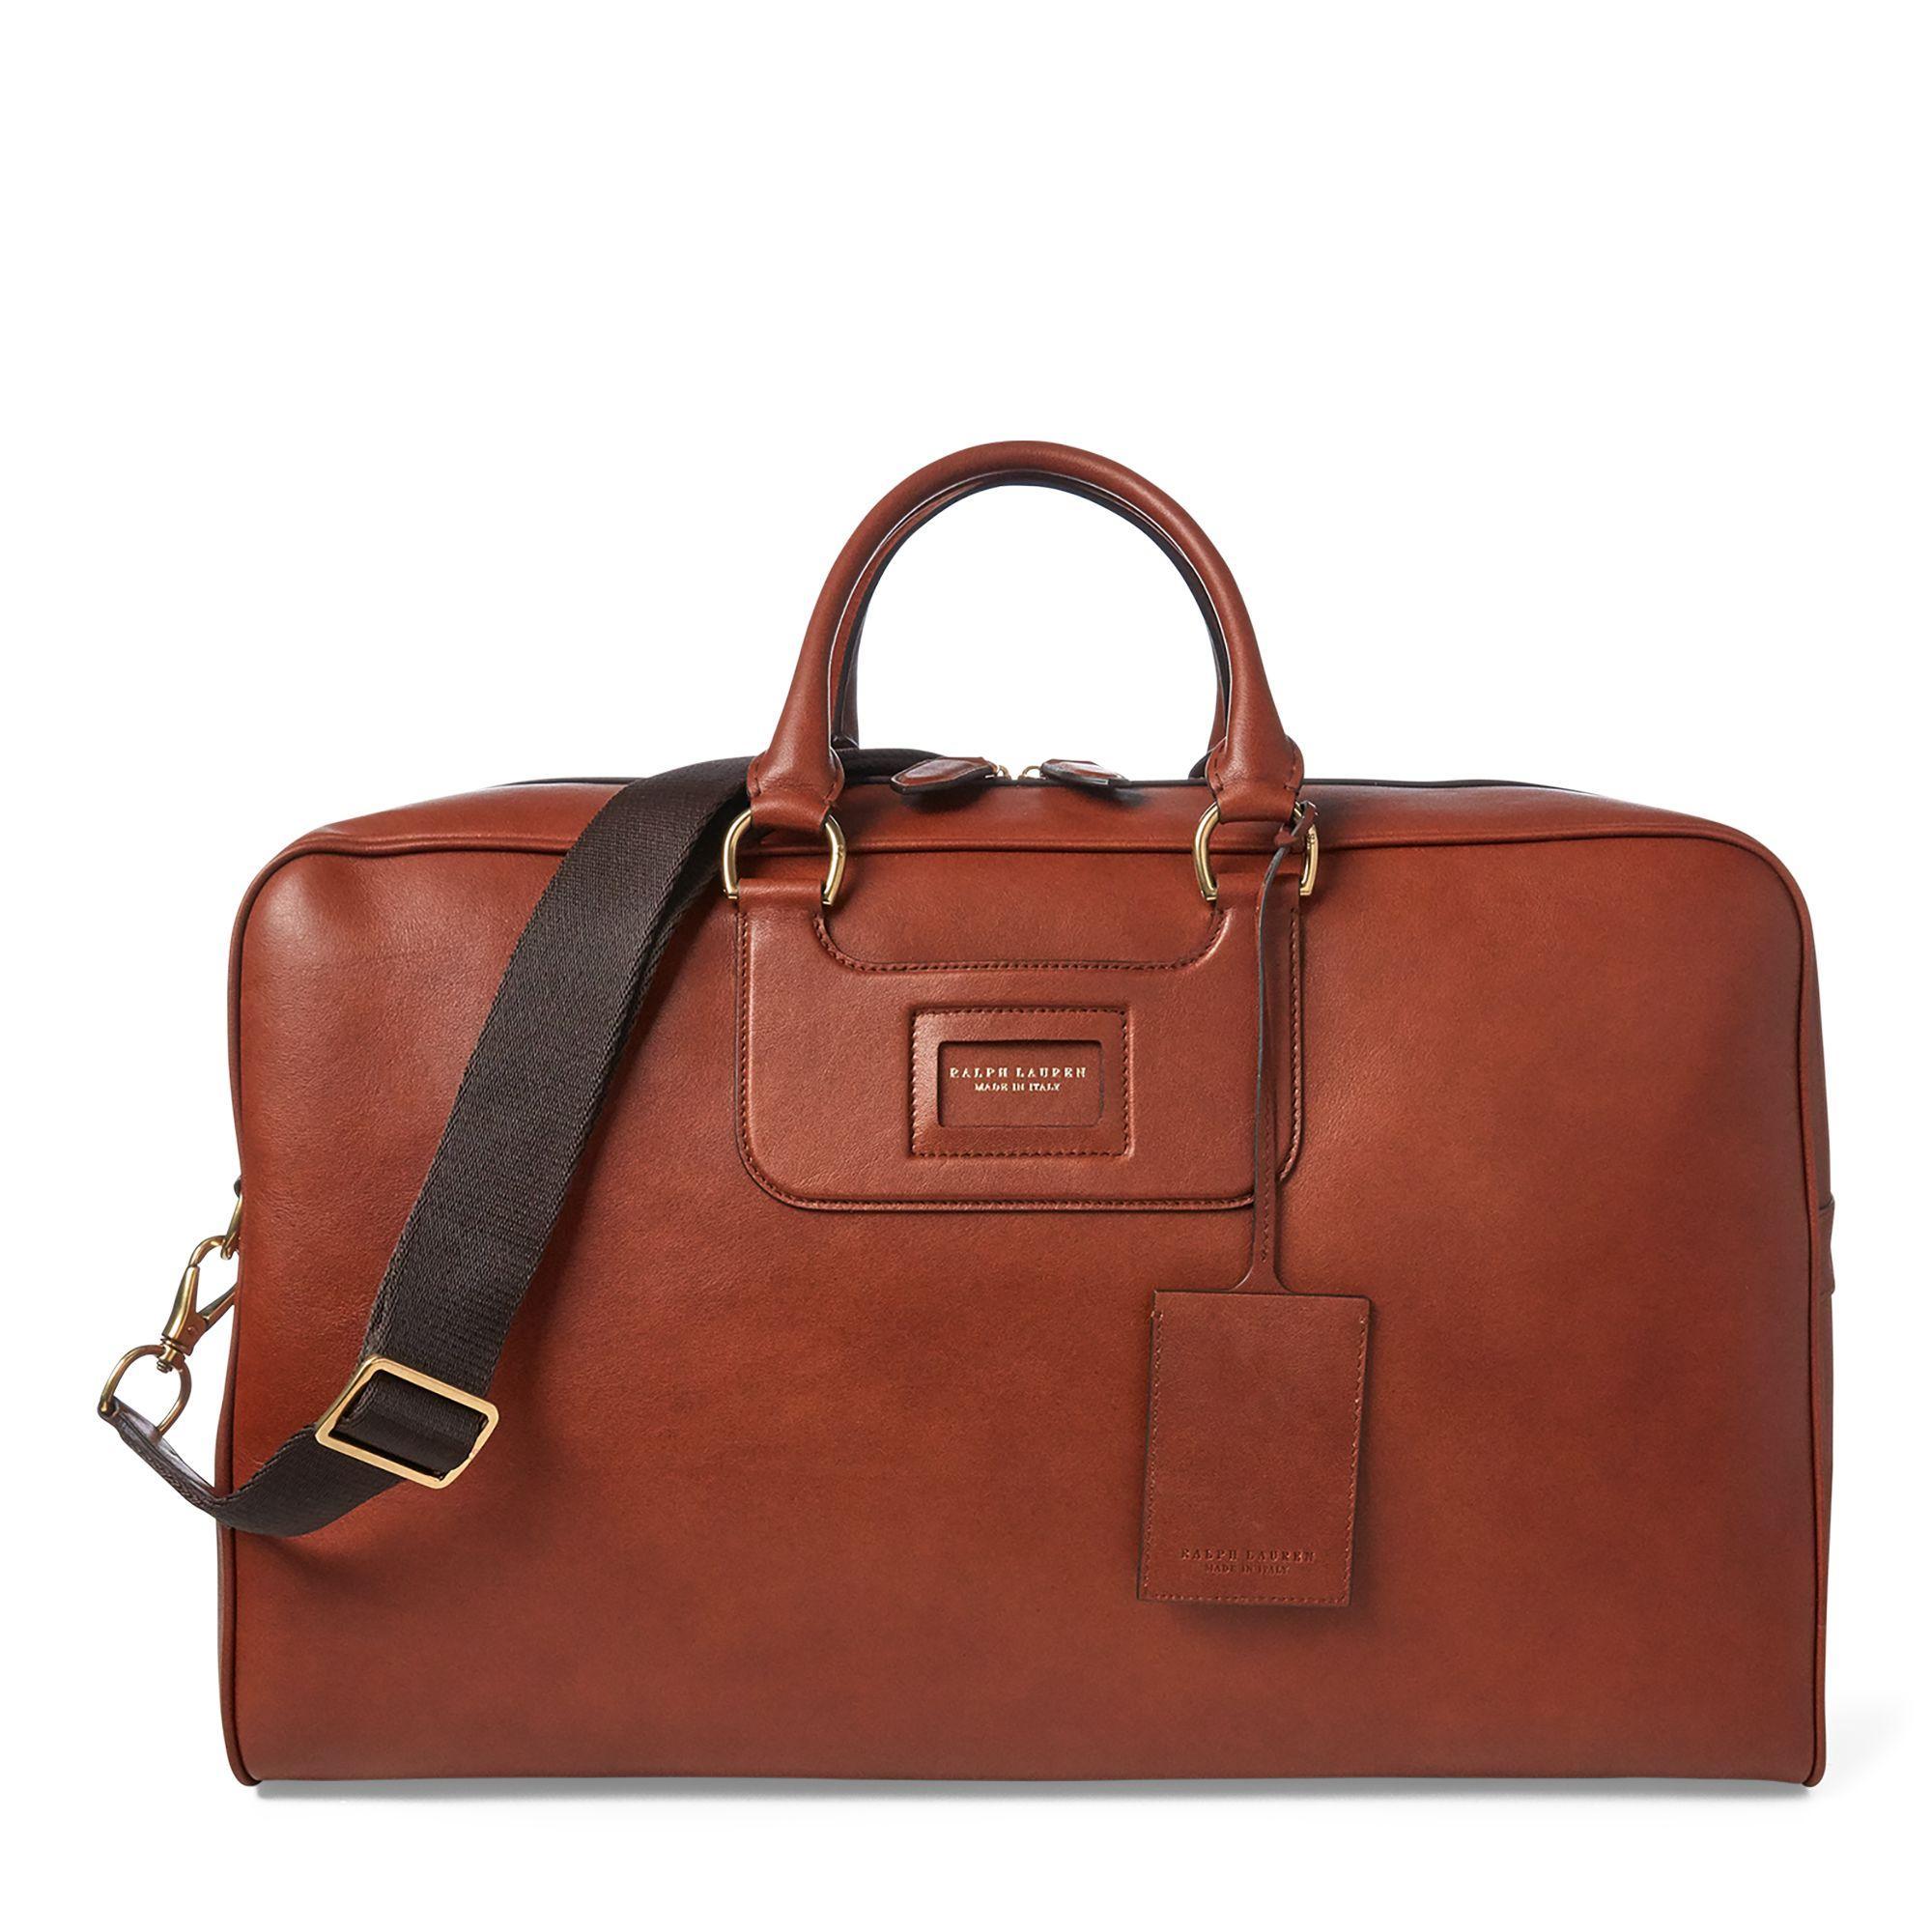 e6e10dbf391 Ralph Lauren Purple Label Calfskin Duffel Bag in Brown for Men - Lyst